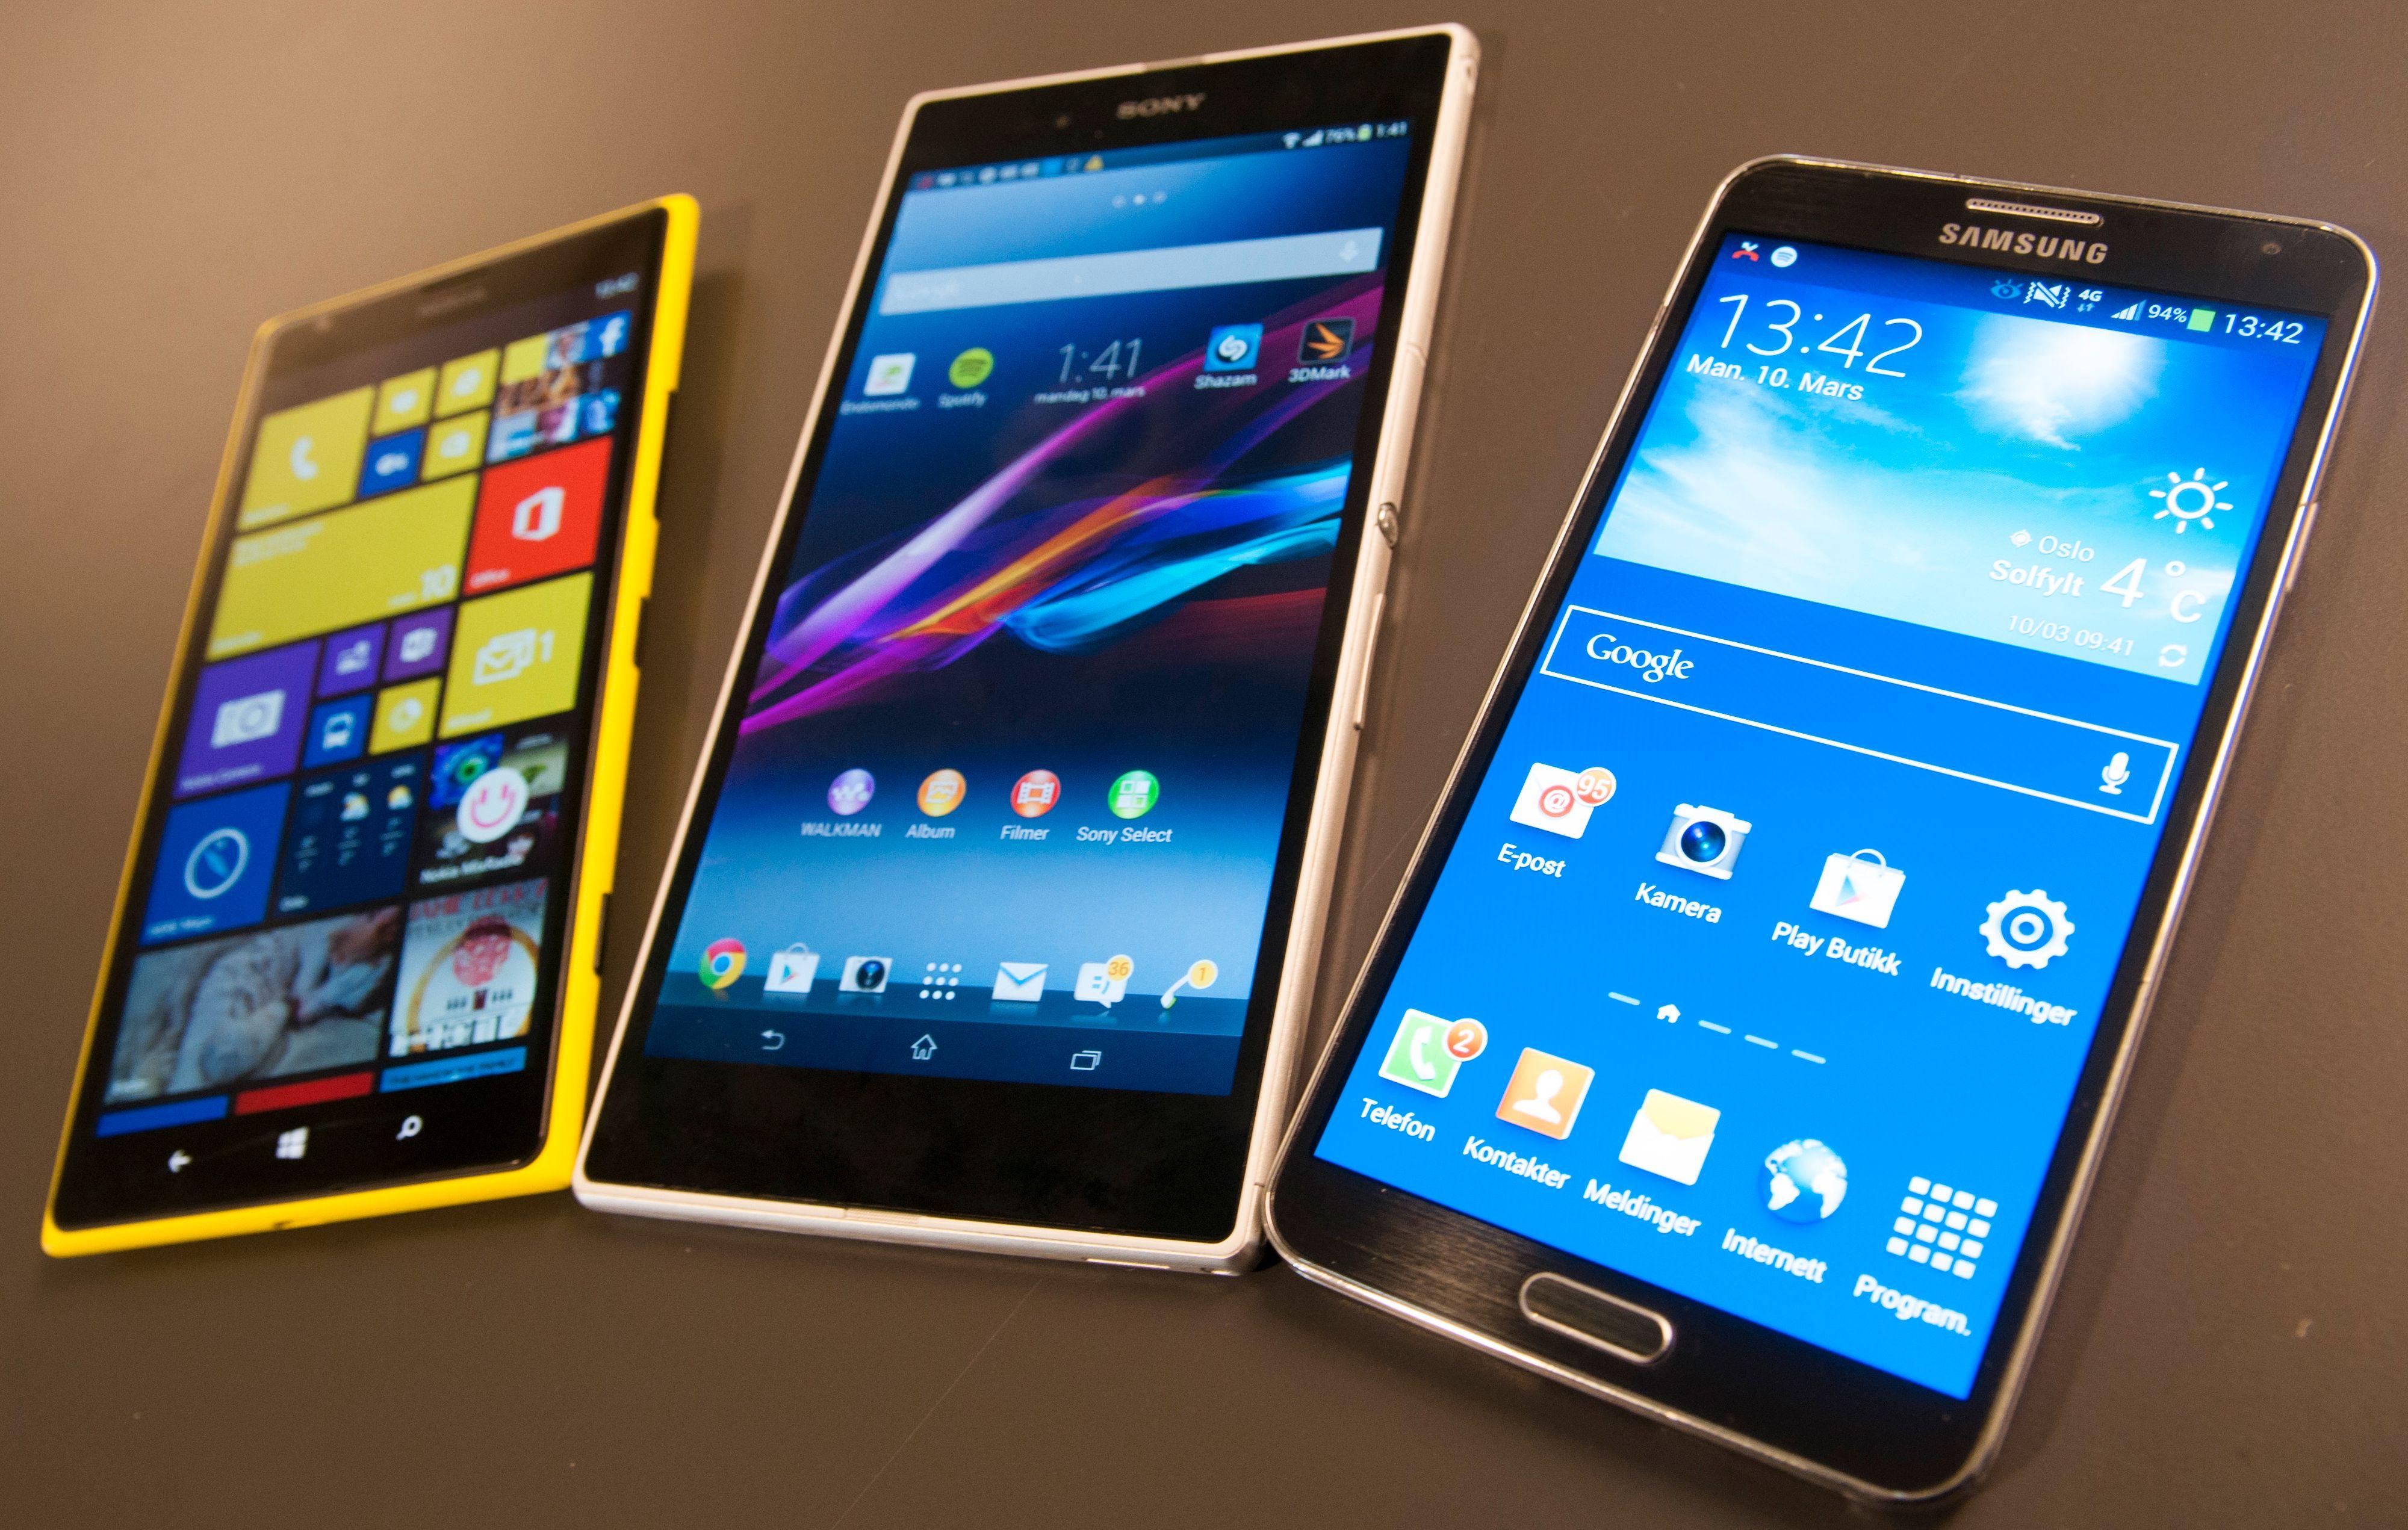 Tre giganter. Fra venstre; Nokia Lumia 1520, Sony Xperia Z og Samsung Galaxy Note III.Foto: Finn Jarle Kvalheim, Amobil.no